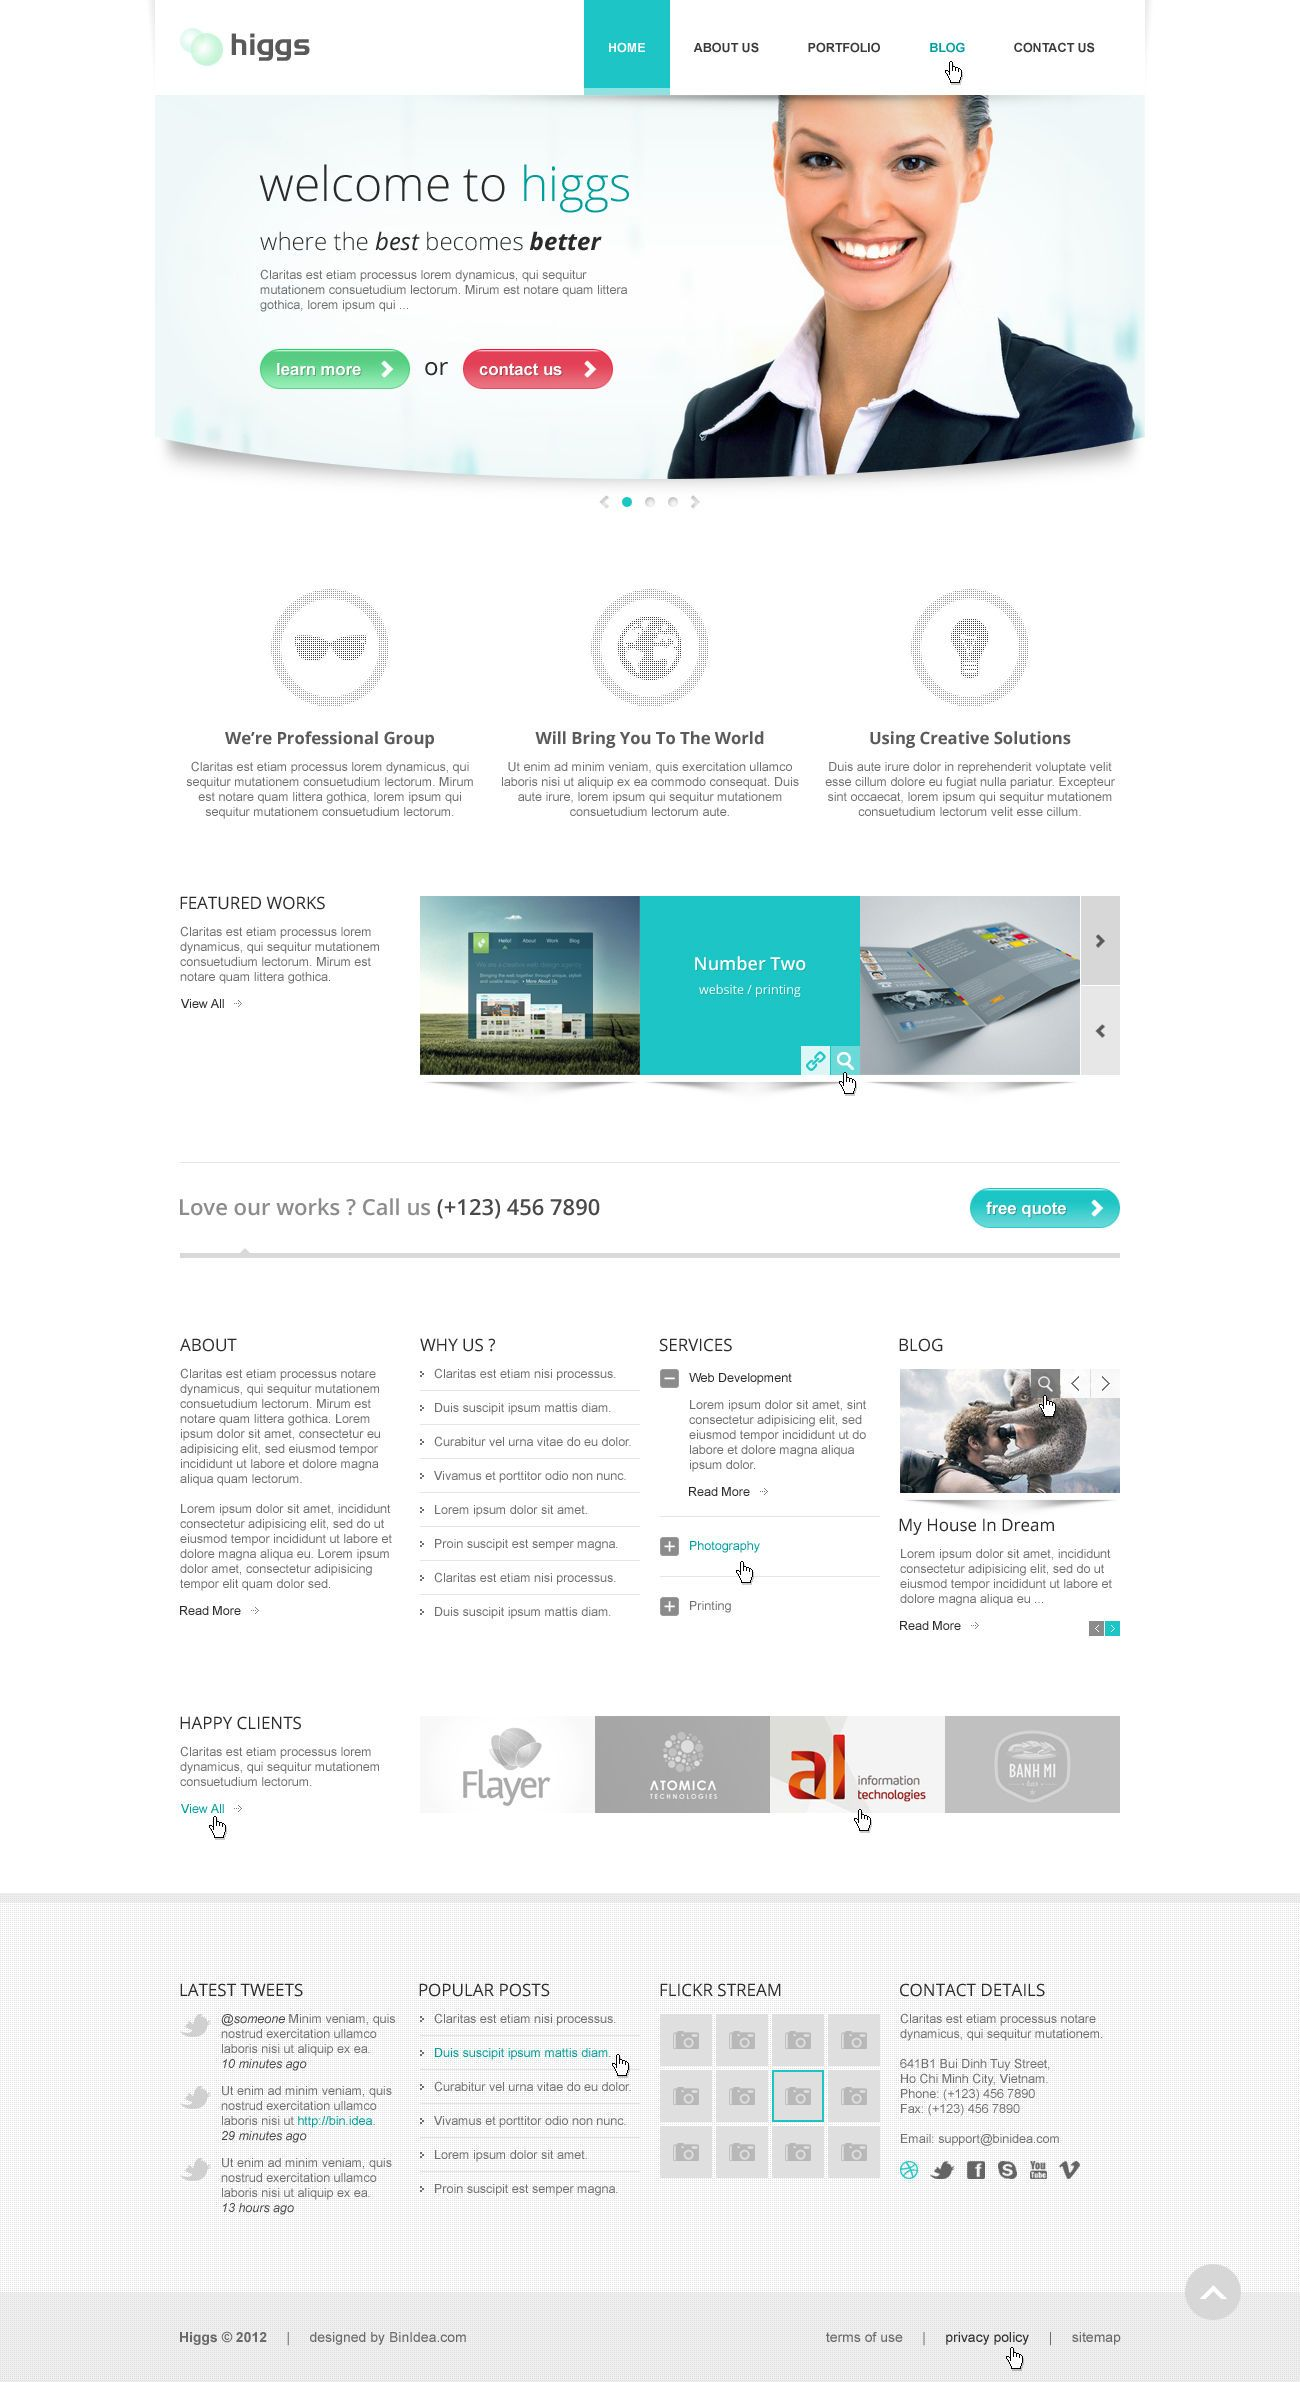 Higgs - Clean & Modern Multi Purpose PSD Template - Mojo Themes #design #webdesign #template #web #graphic #psd #photoshop #website